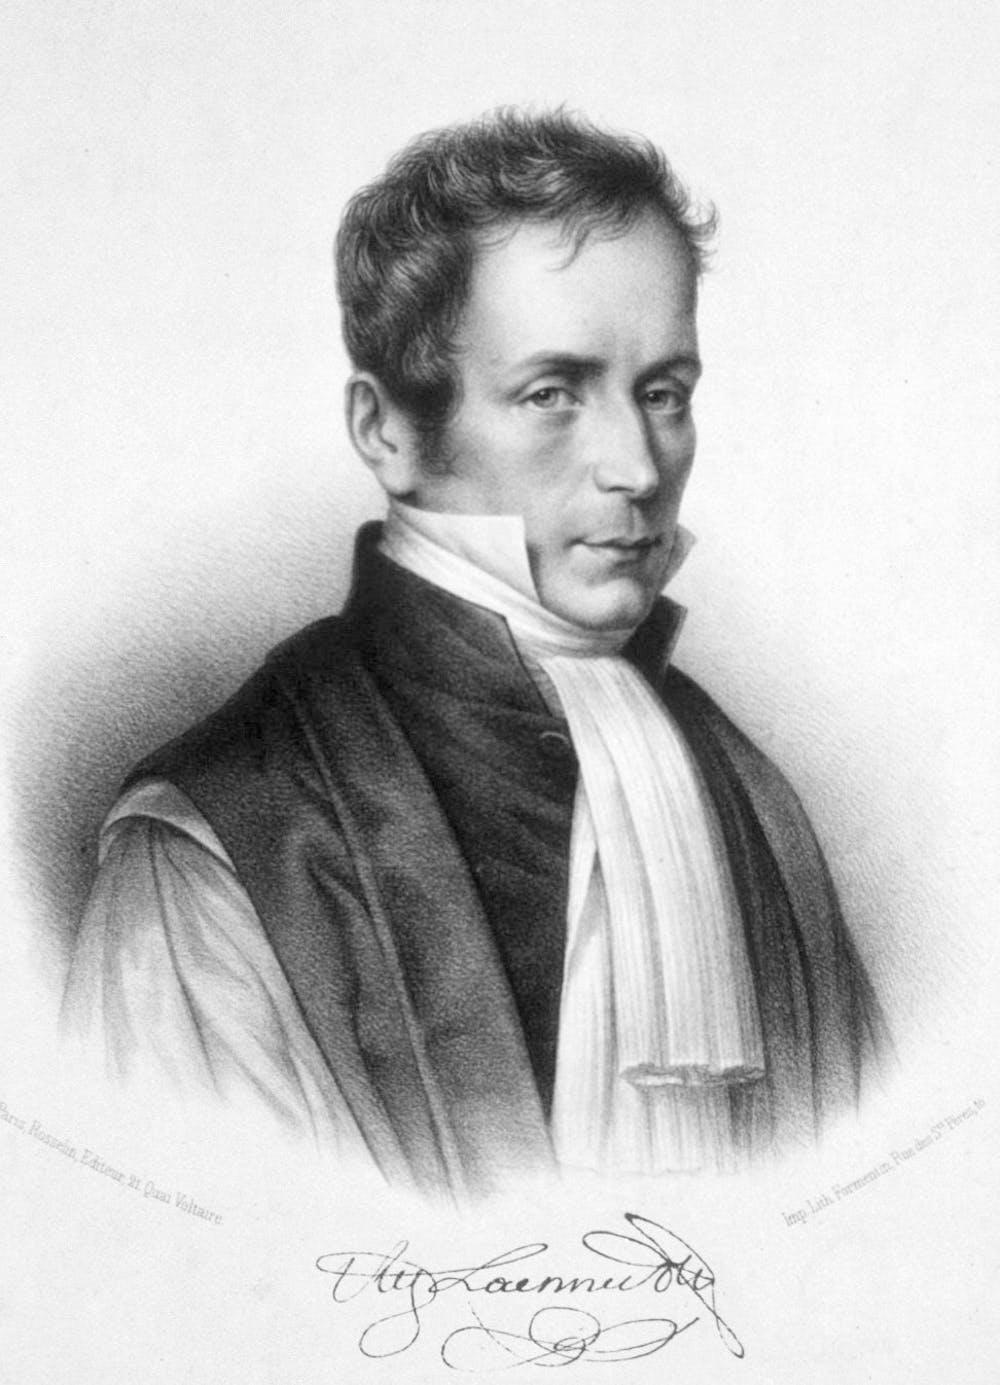 Rene Laennec (autor desconocido). Wikimedia Commons